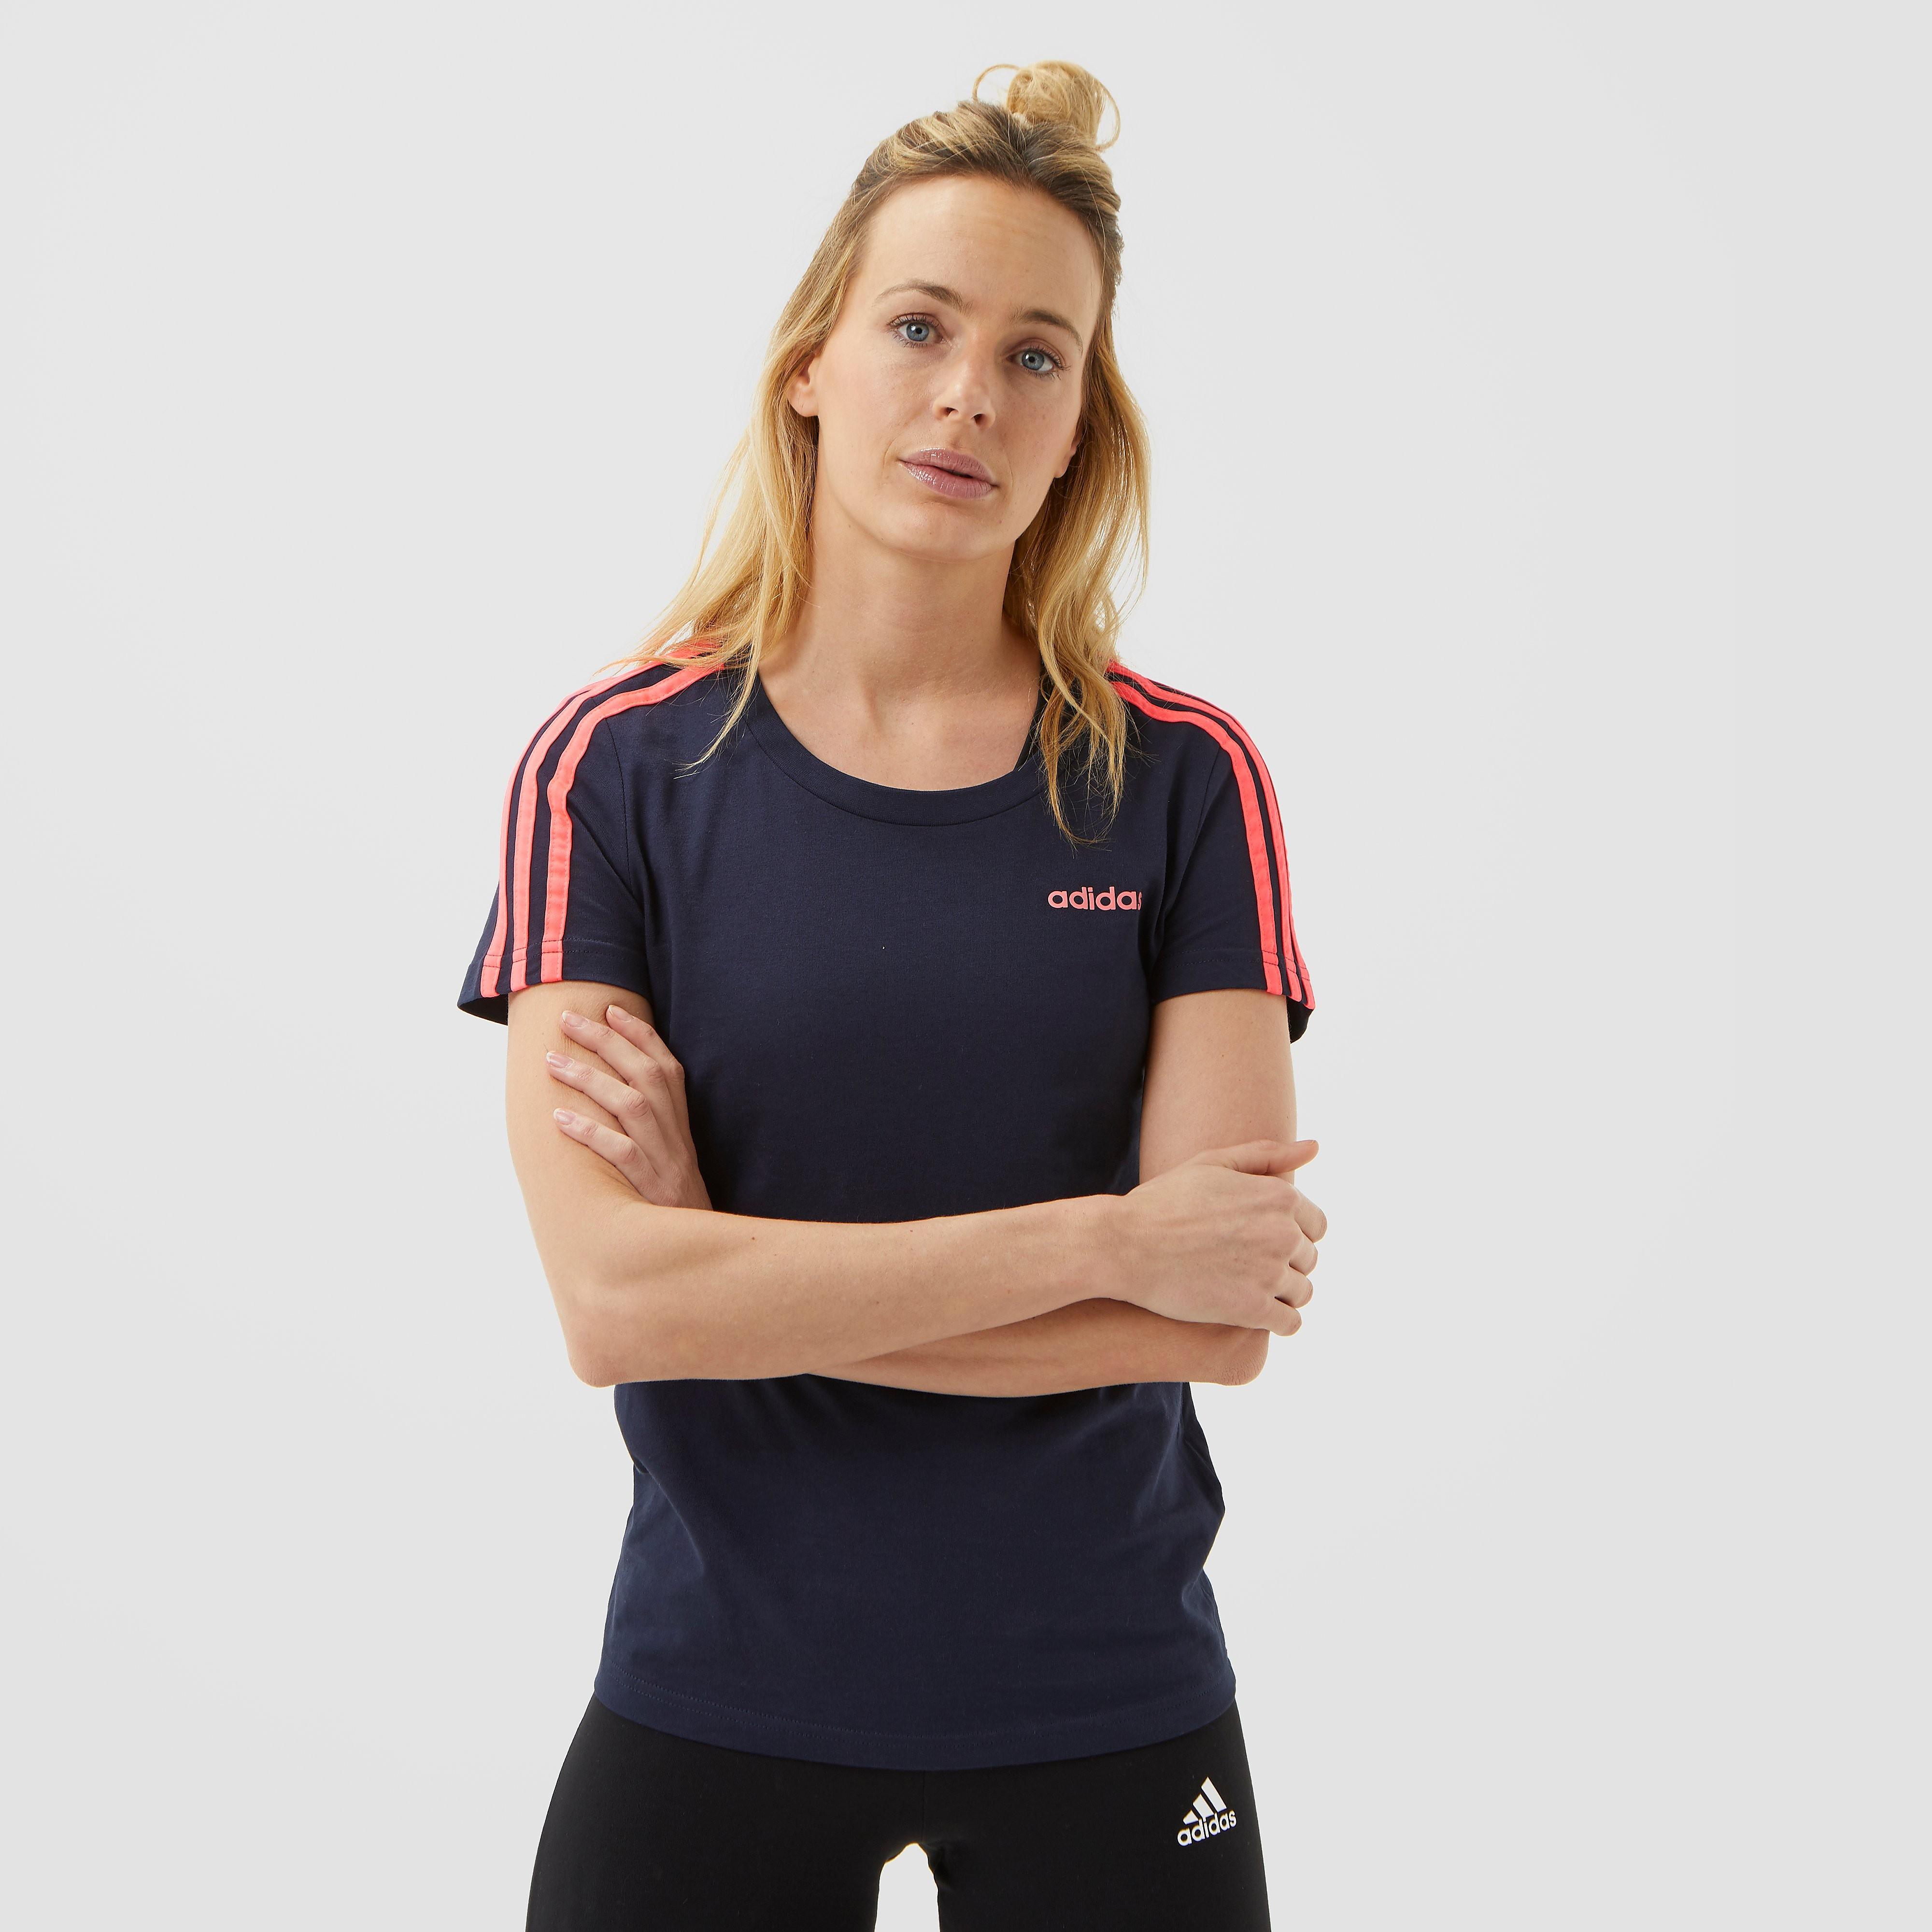 adidas 3-stripes slim shirt blauw/roze dames Dames